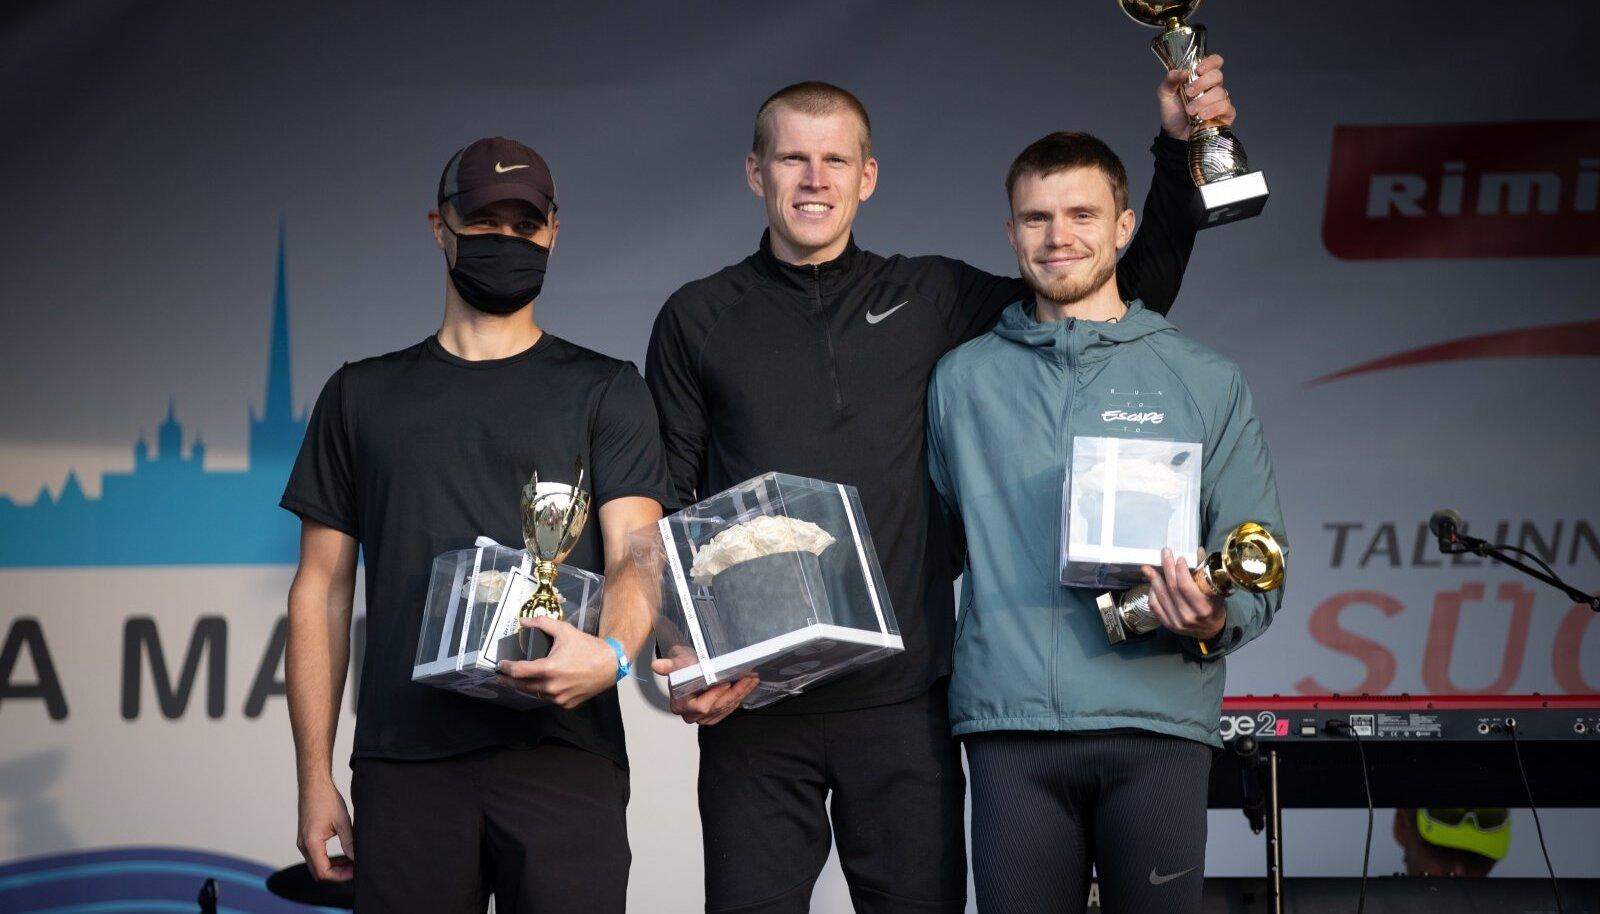 Tallinna Maratoni RIMI Sügisjooks 10 km